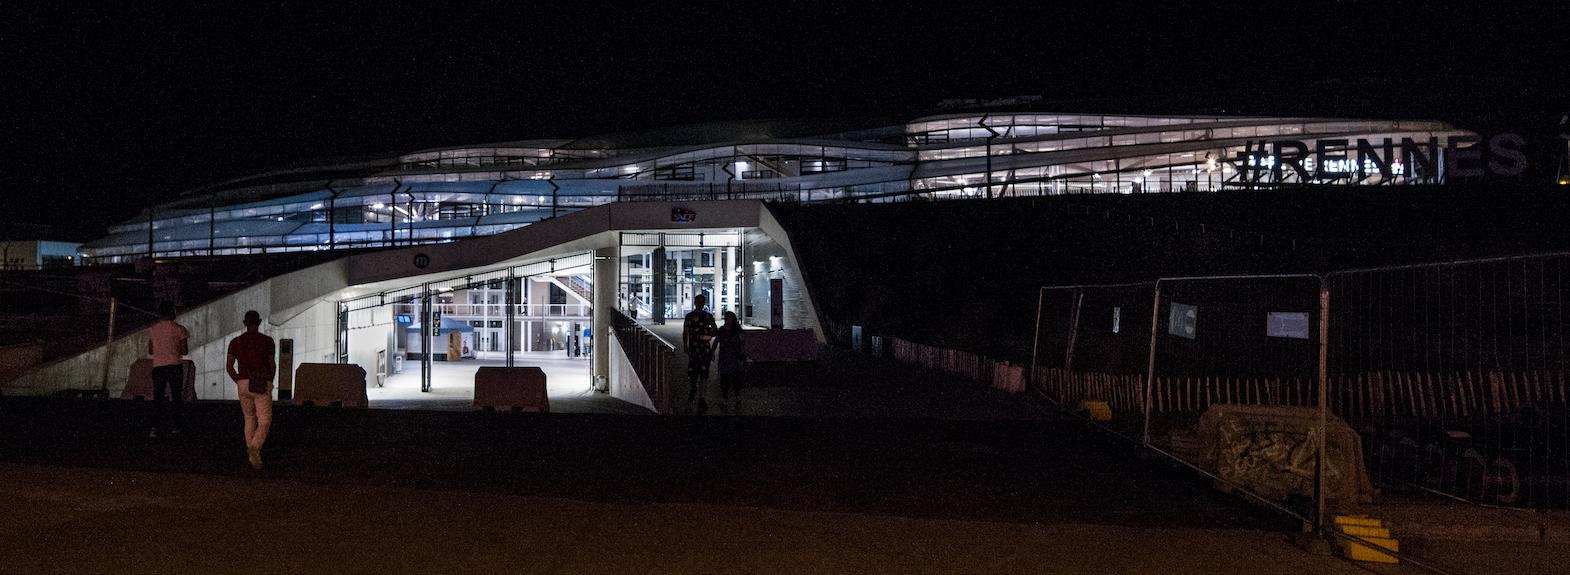 5-Gare_entree_Nord_de_nuit-juin_2019.jpg